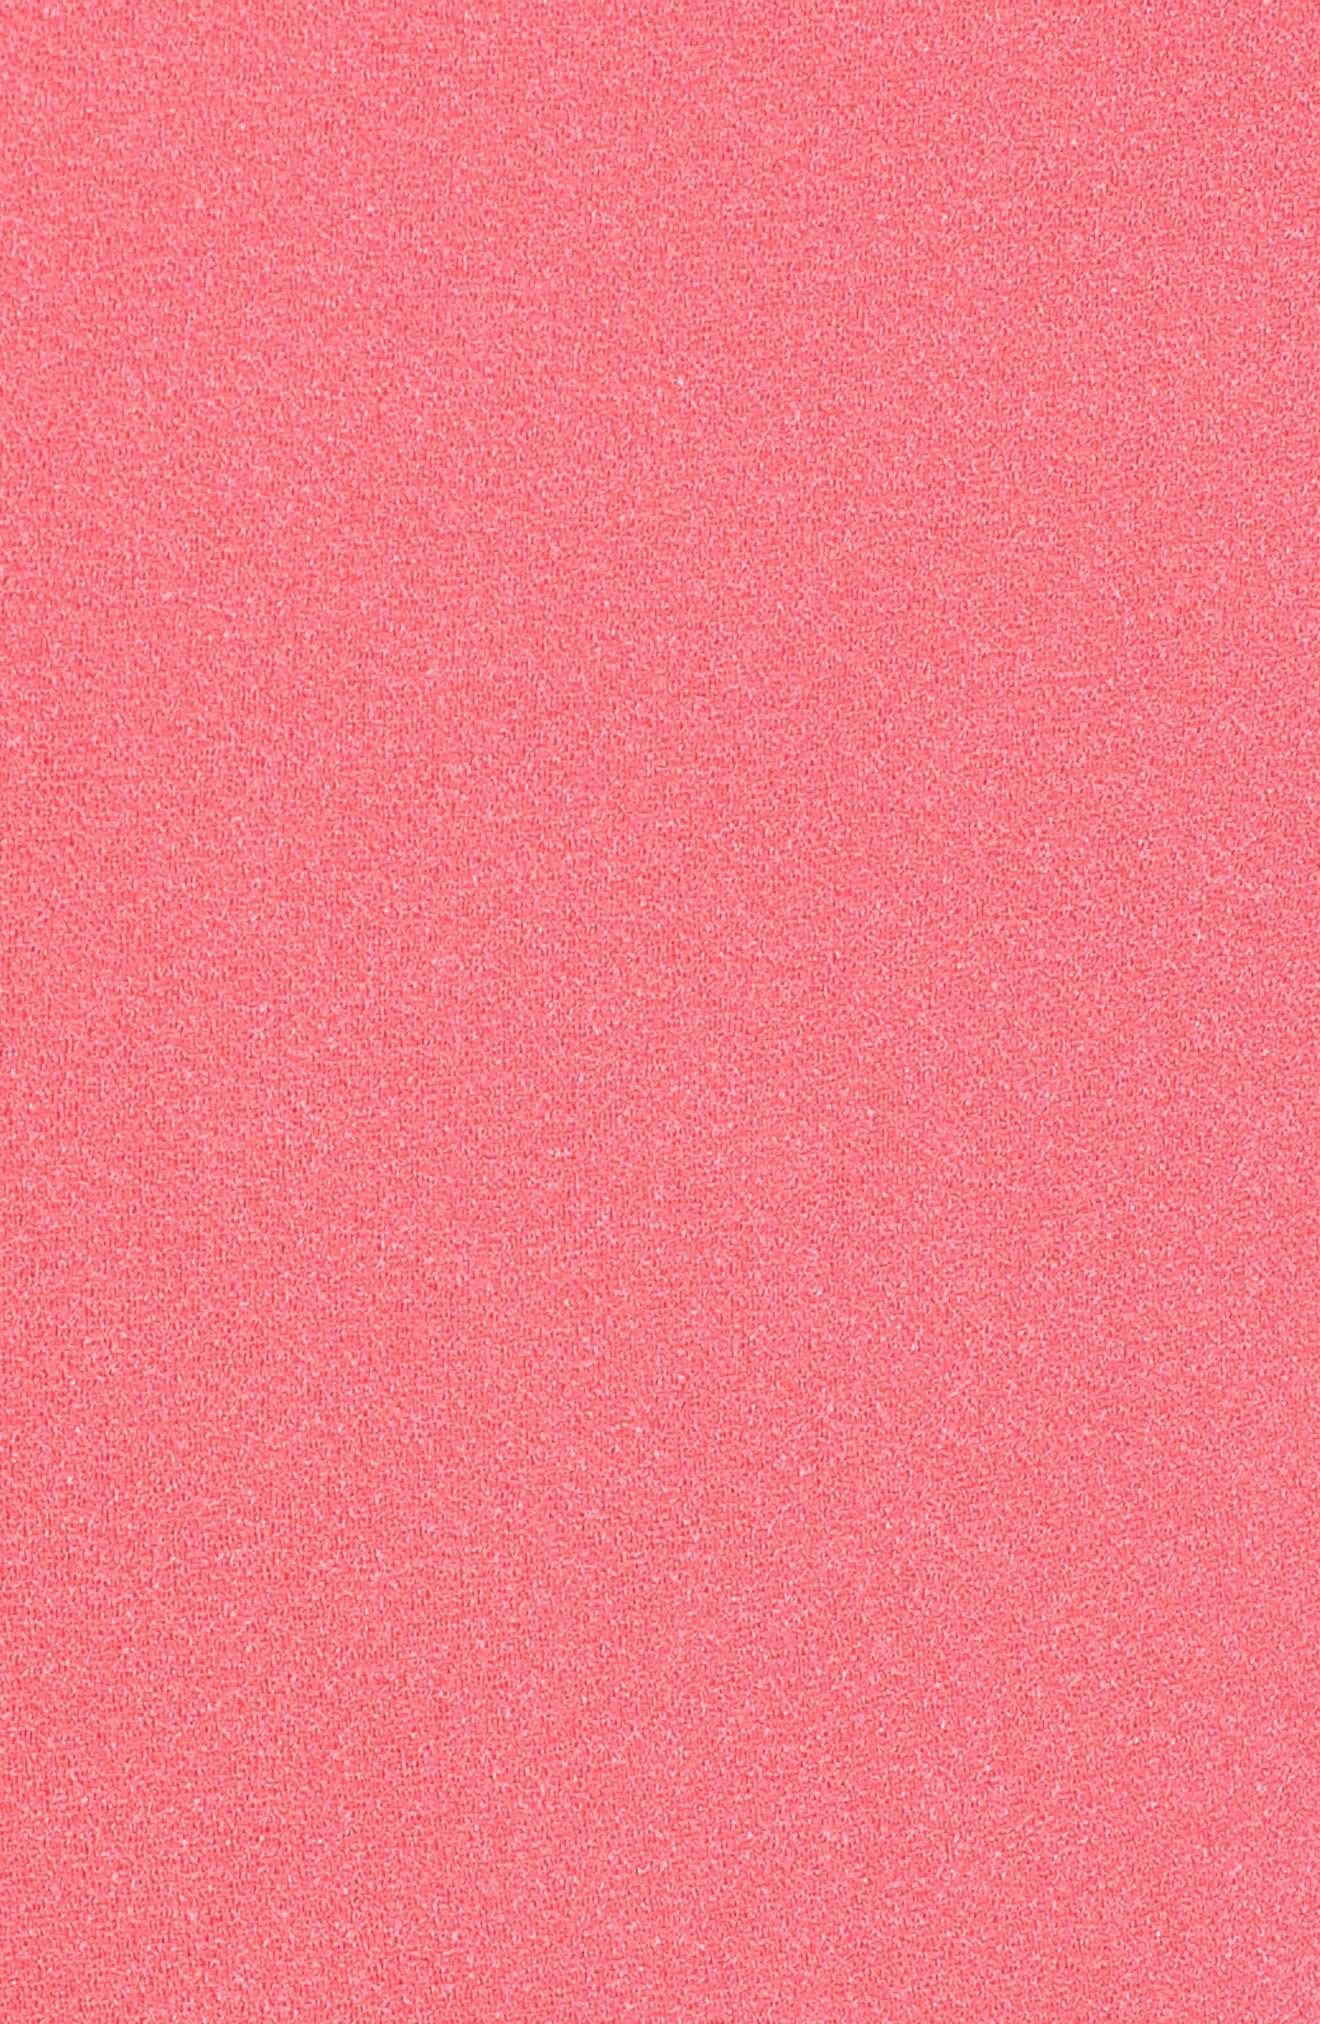 Daphima Compact Crepe Sheath Dress,                             Alternate thumbnail 6, color,                             692